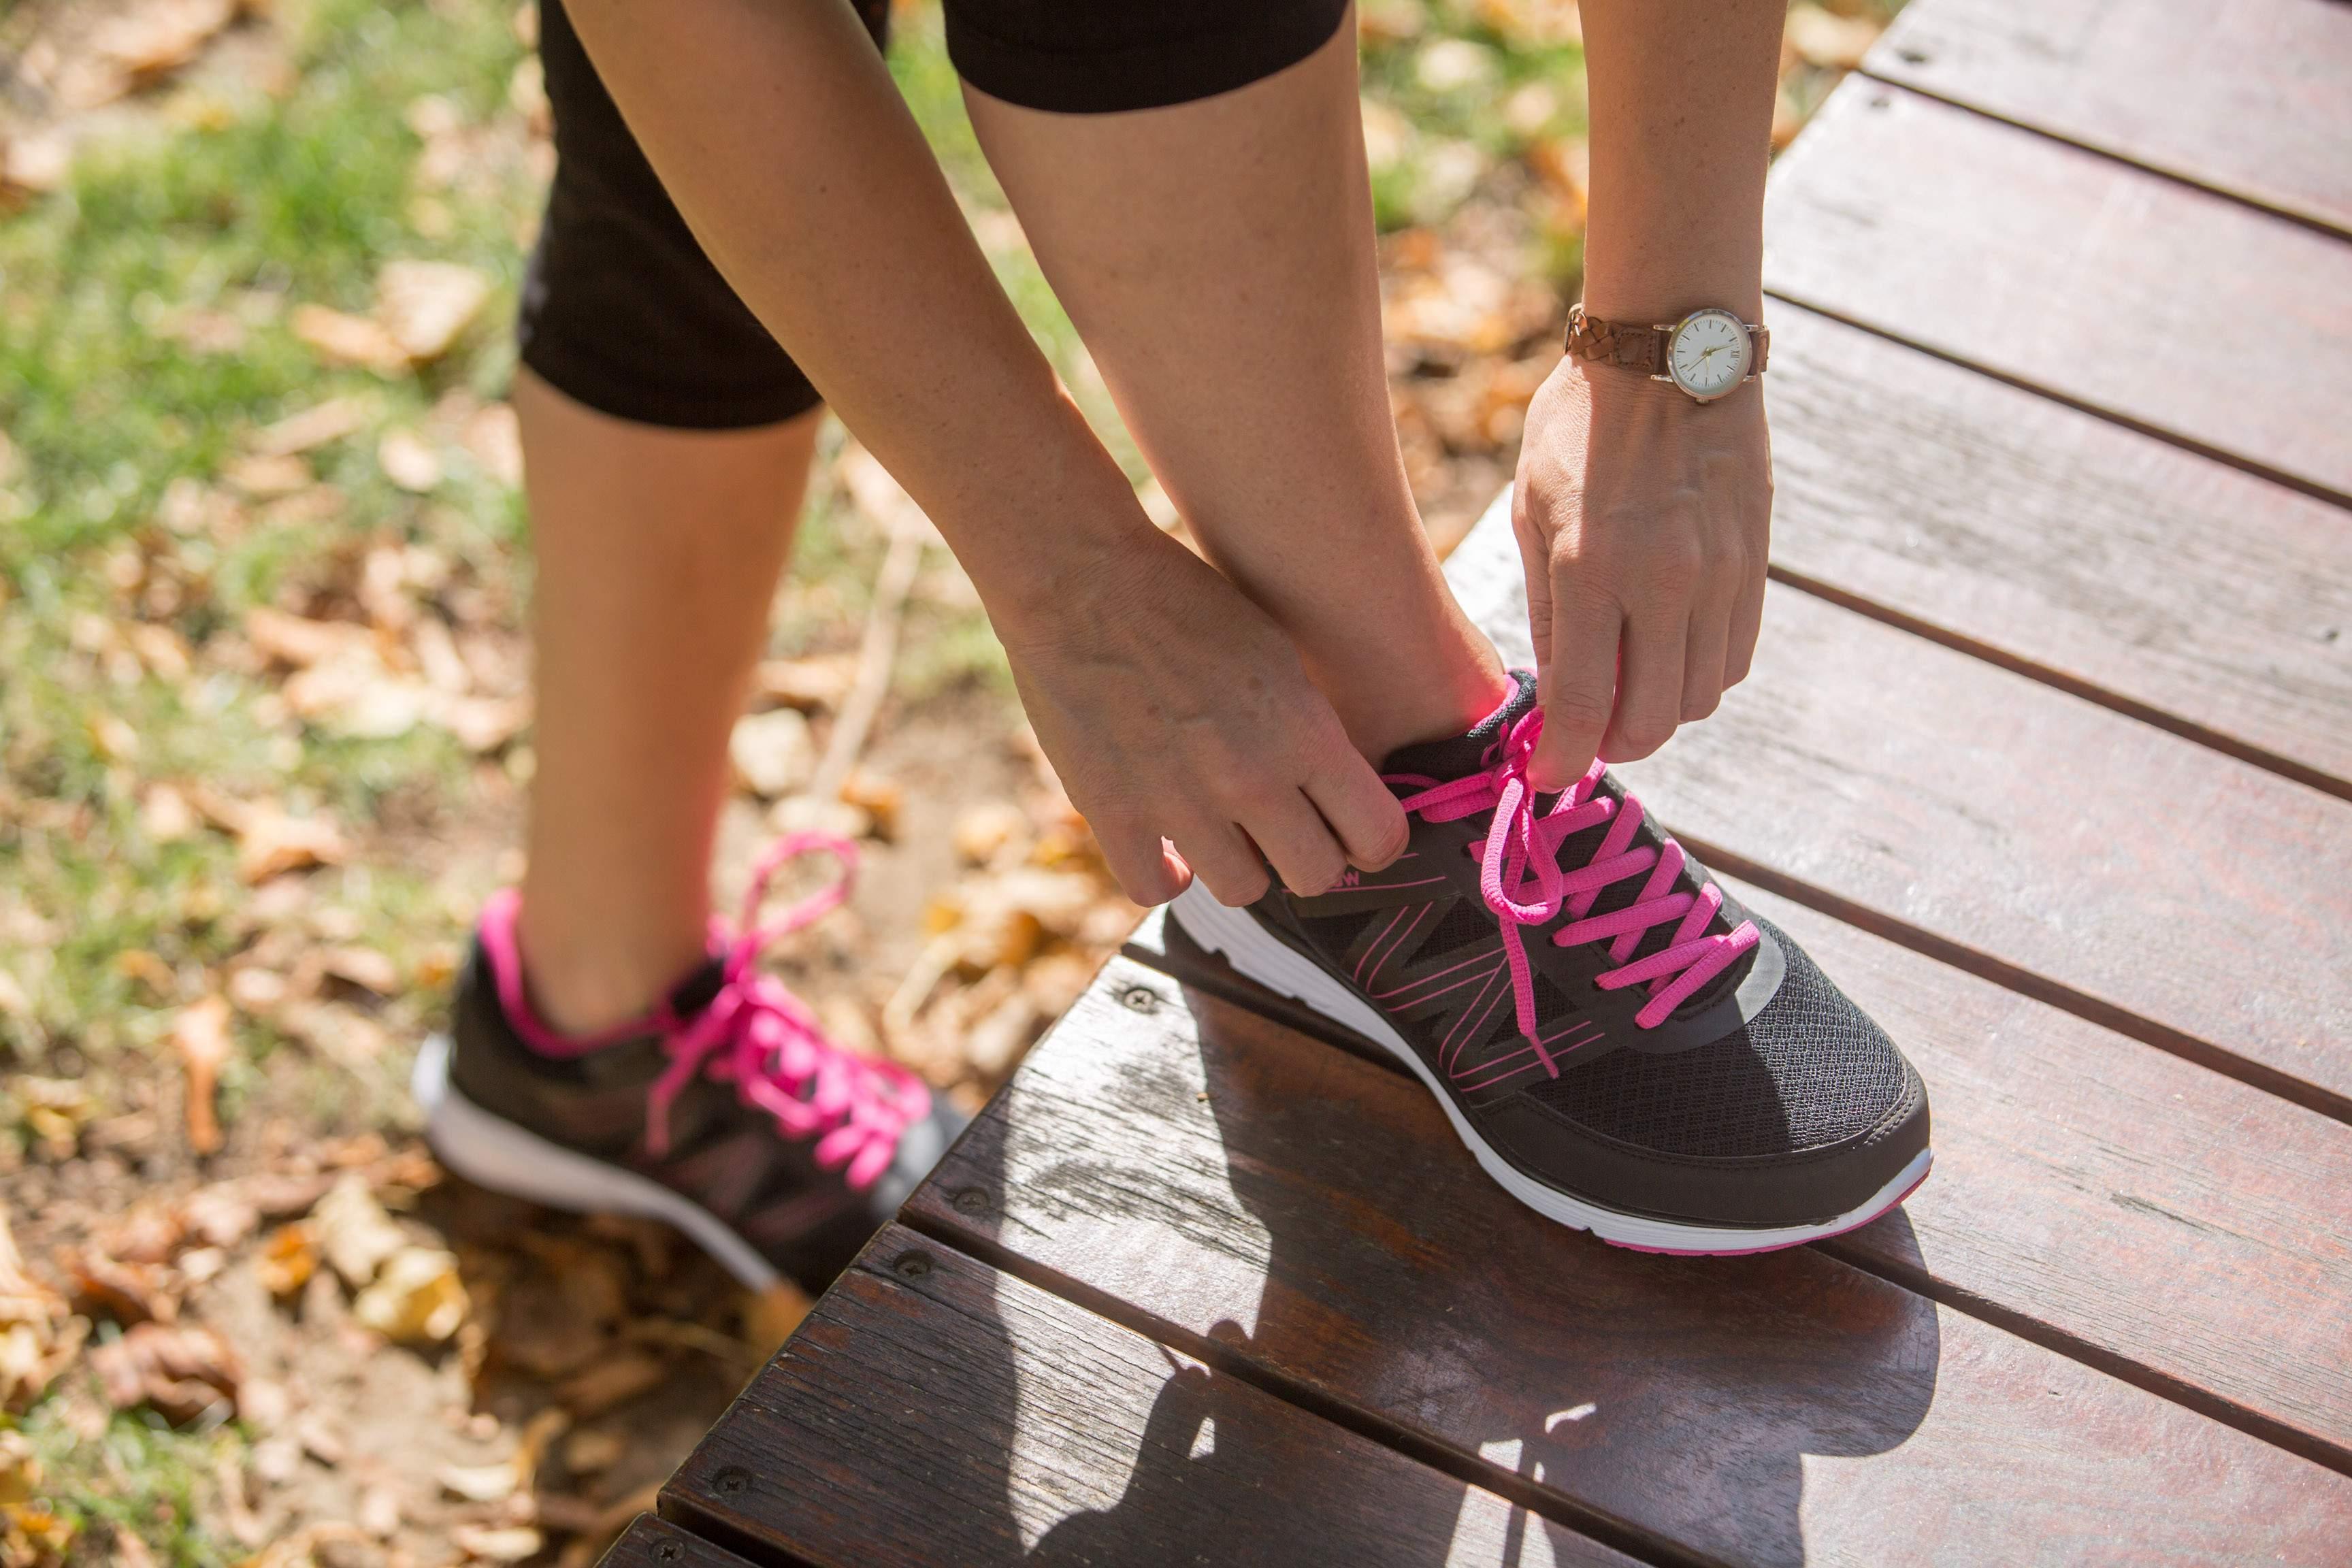 91bee3163aaf Športové topánky pre široké nohy a ortopedické problémy - ZDRAVIE.sk